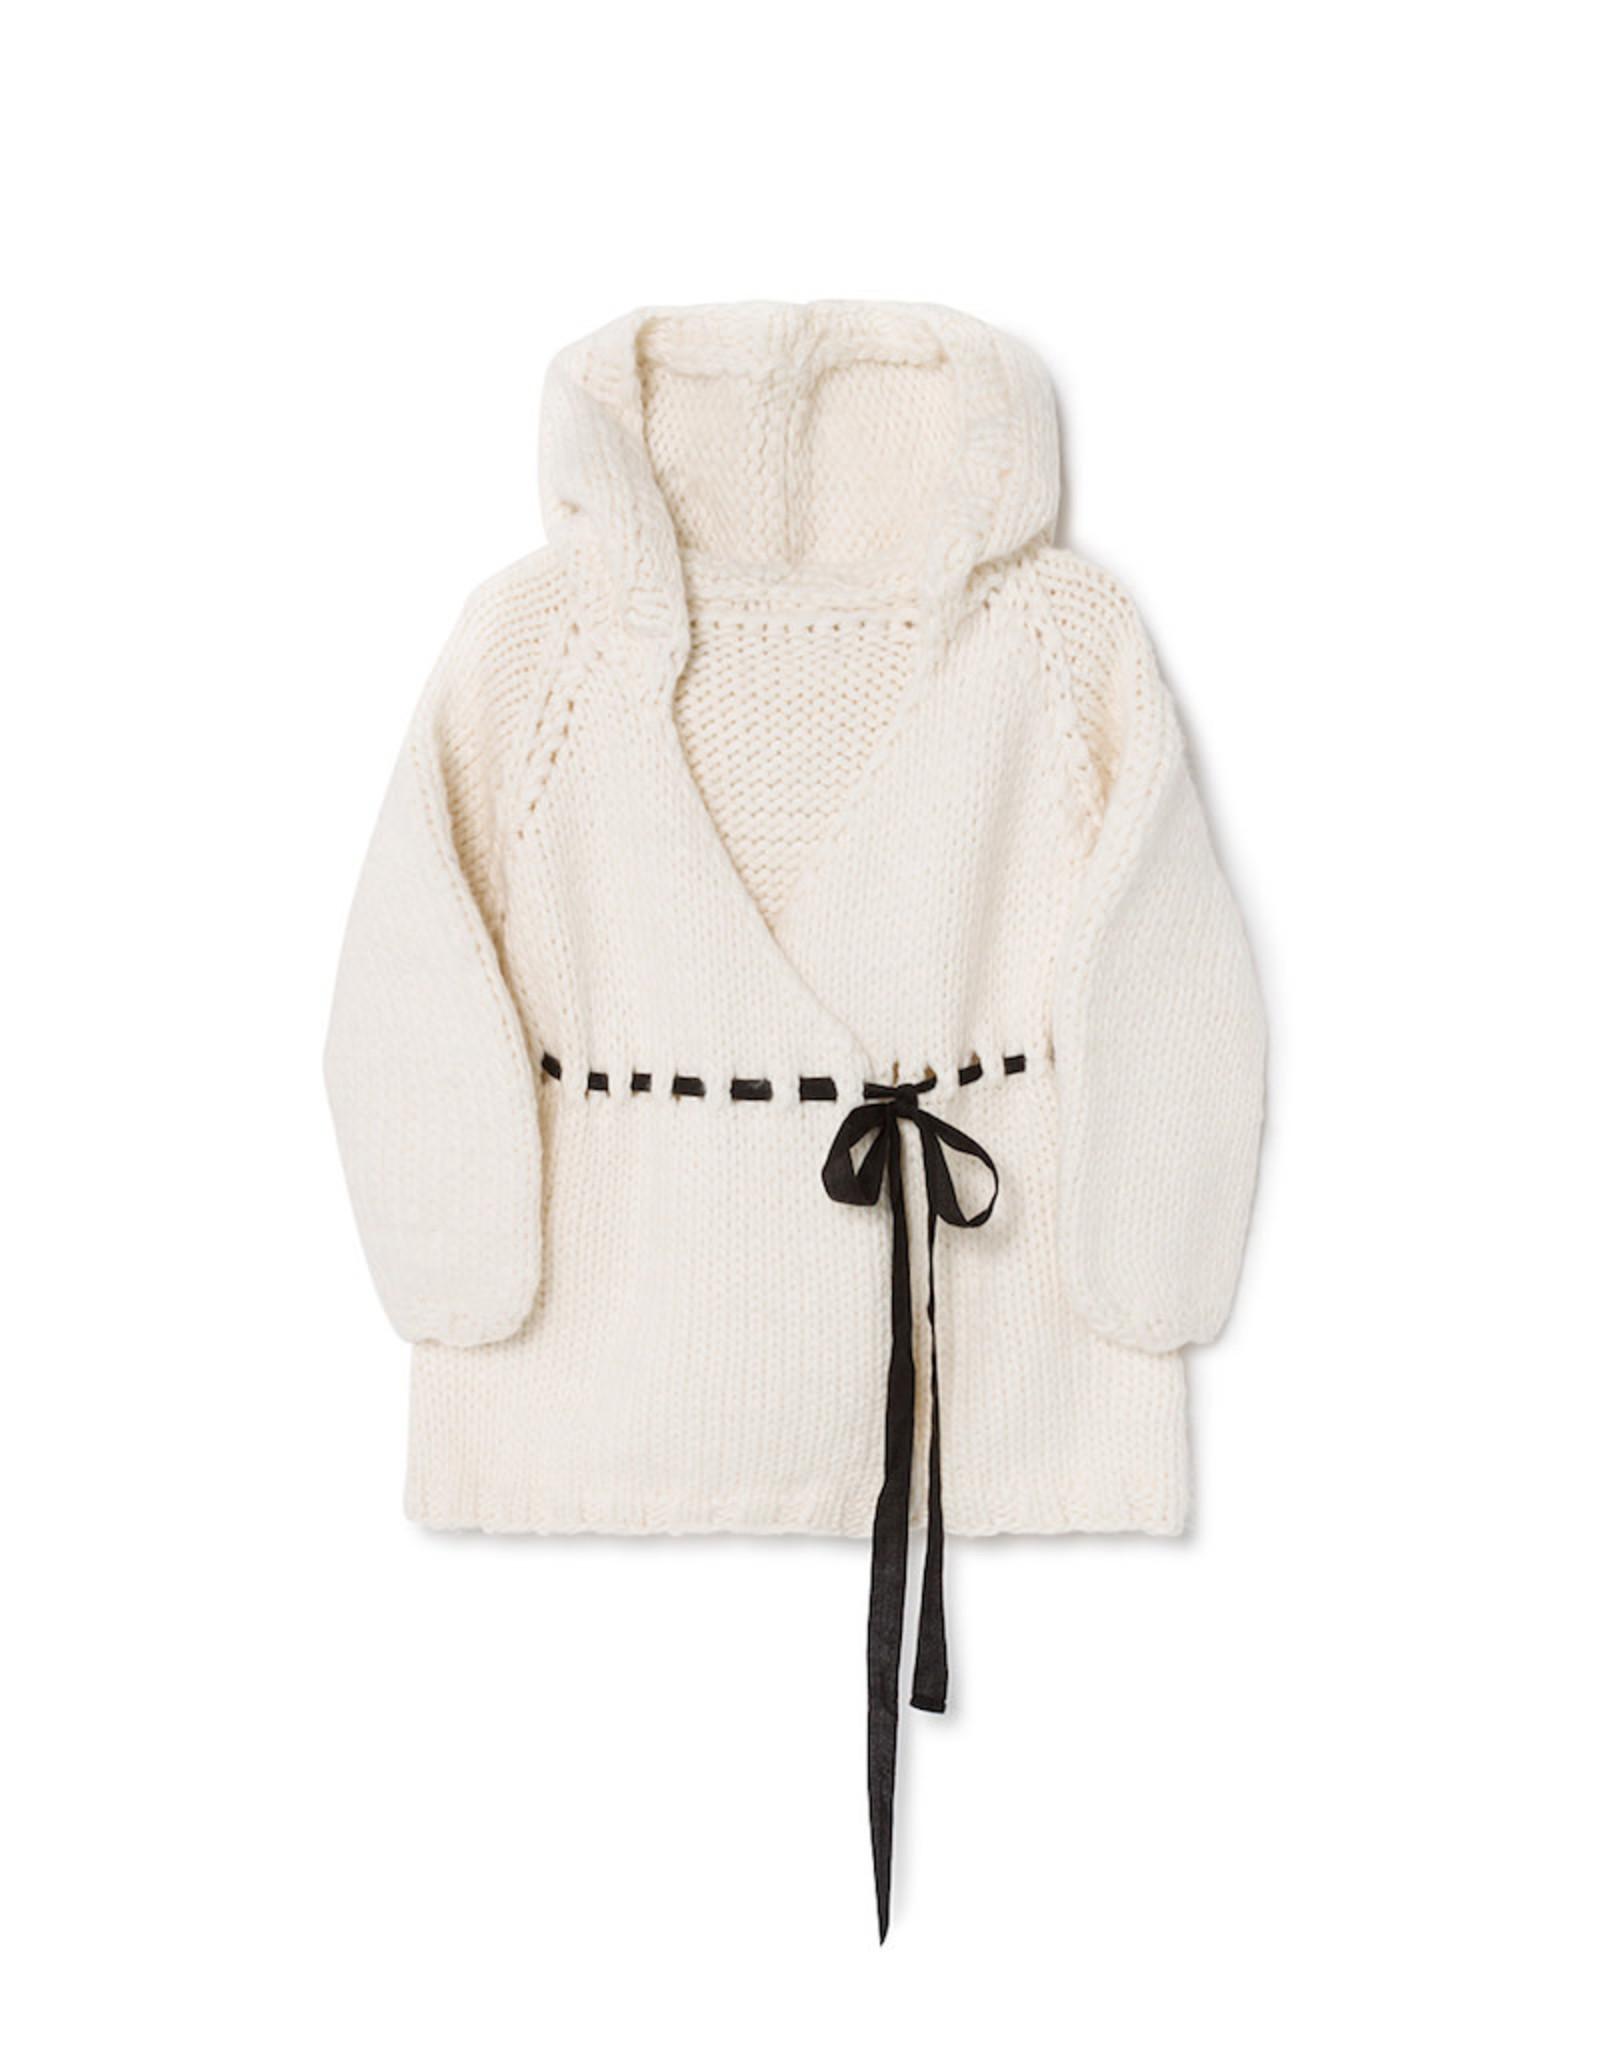 Little Creative Factory Chunky Knit Jacket Cream